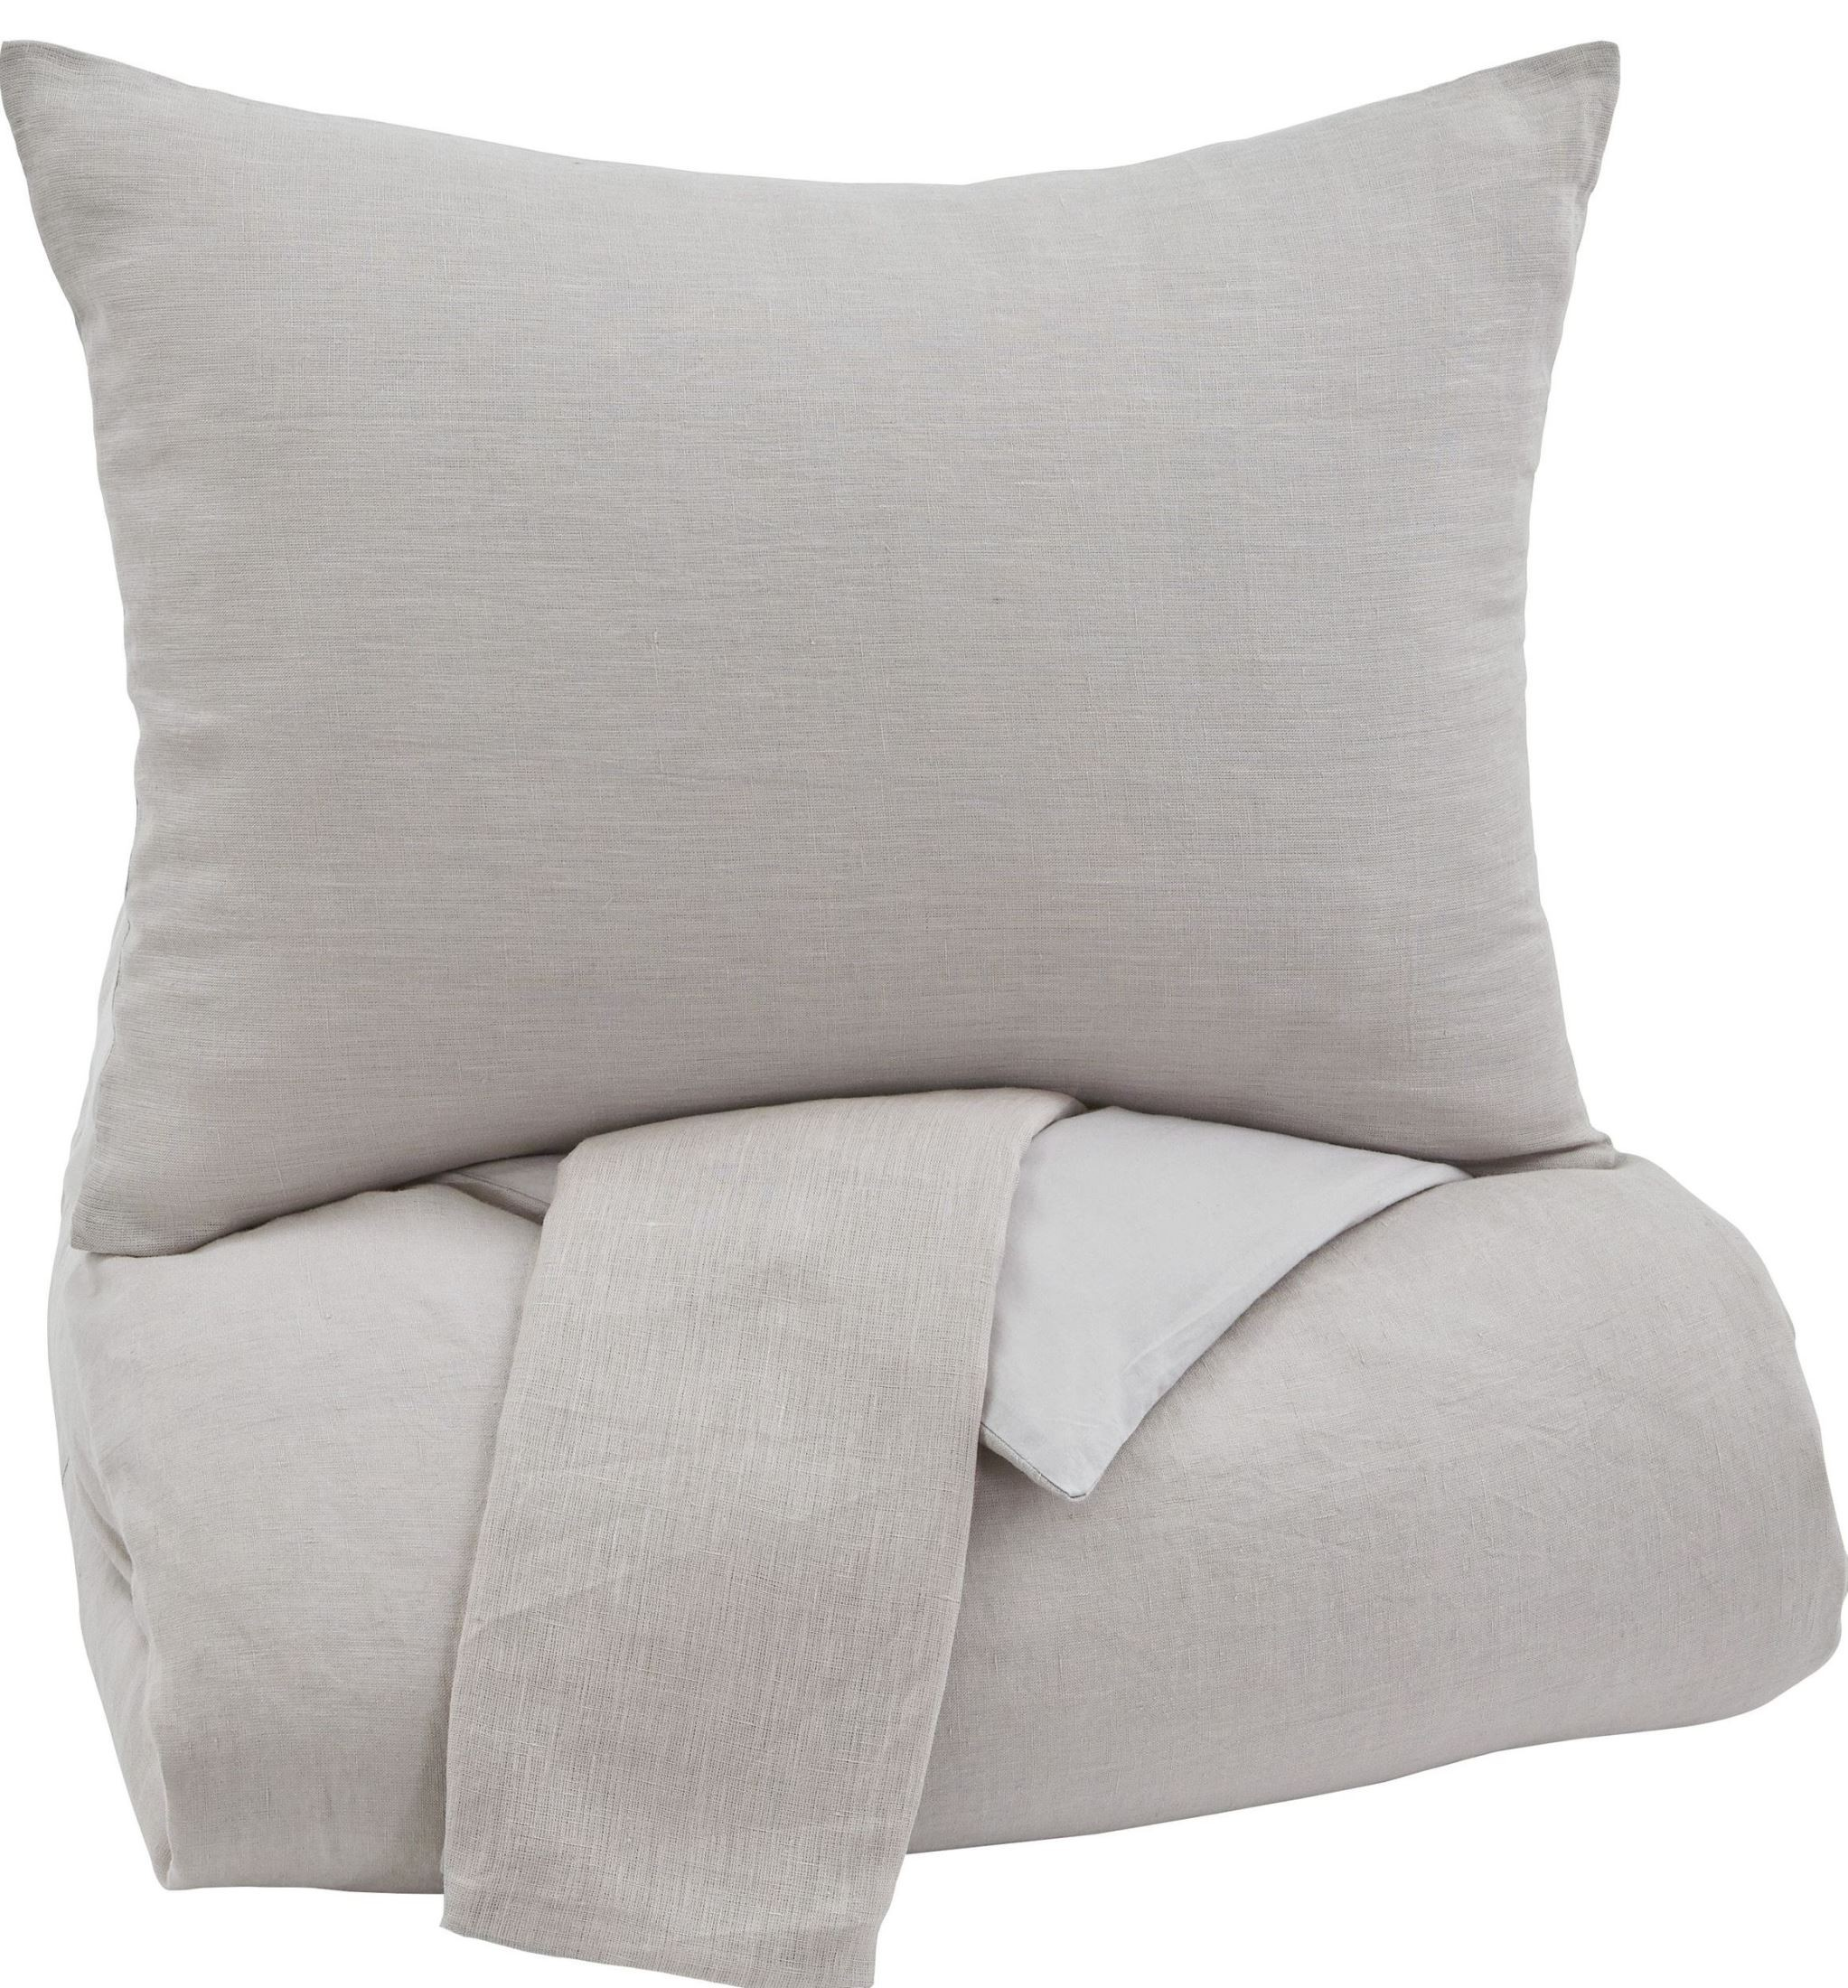 bergden light gray queen duvet cover set from ashley q734023q coleman furniture. Black Bedroom Furniture Sets. Home Design Ideas